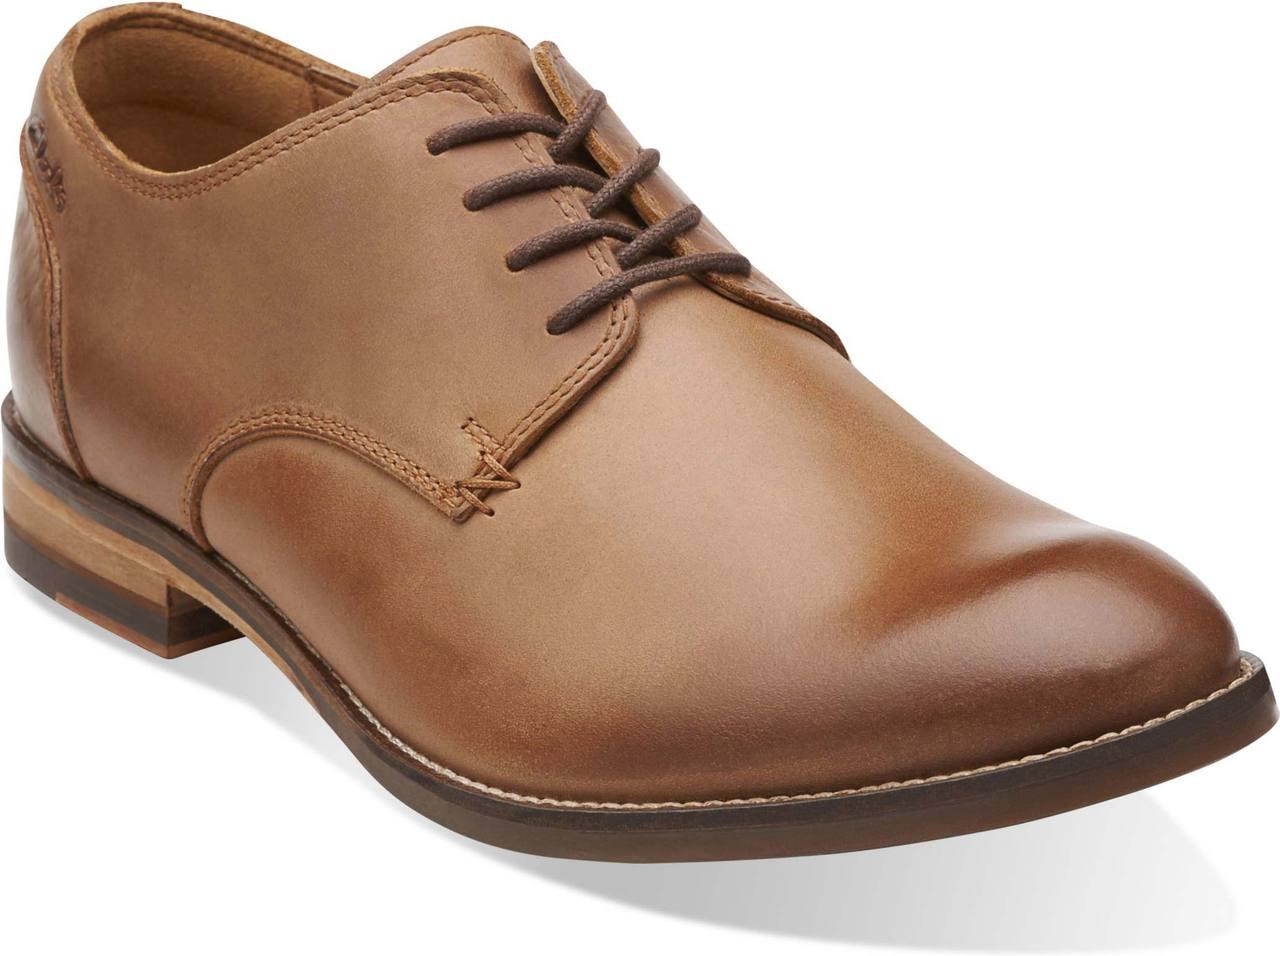 Mens Dress Shoes Clarks Exton Walk Mens Dress Dress Shoes Amazing price